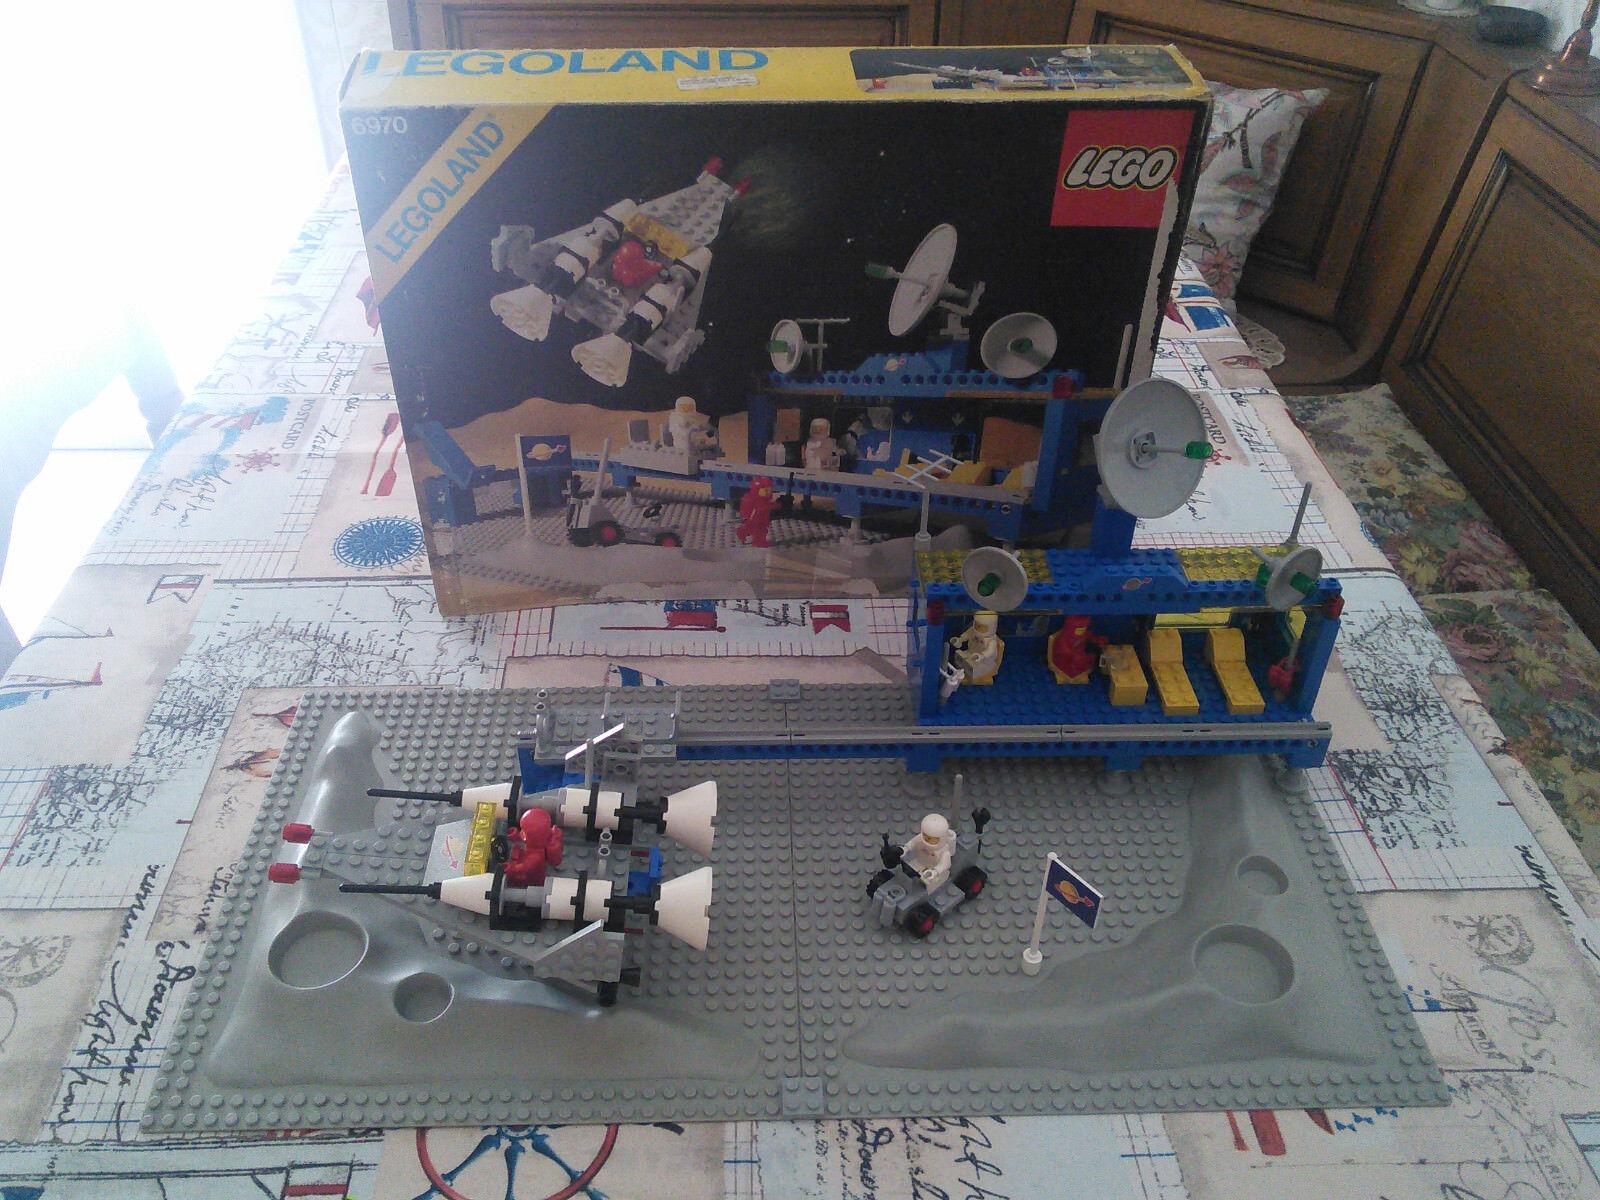 LEGO Classic Space 6970 LEGOLAND Beta 1 Base Comando Box Istruzioni Vintage 1981